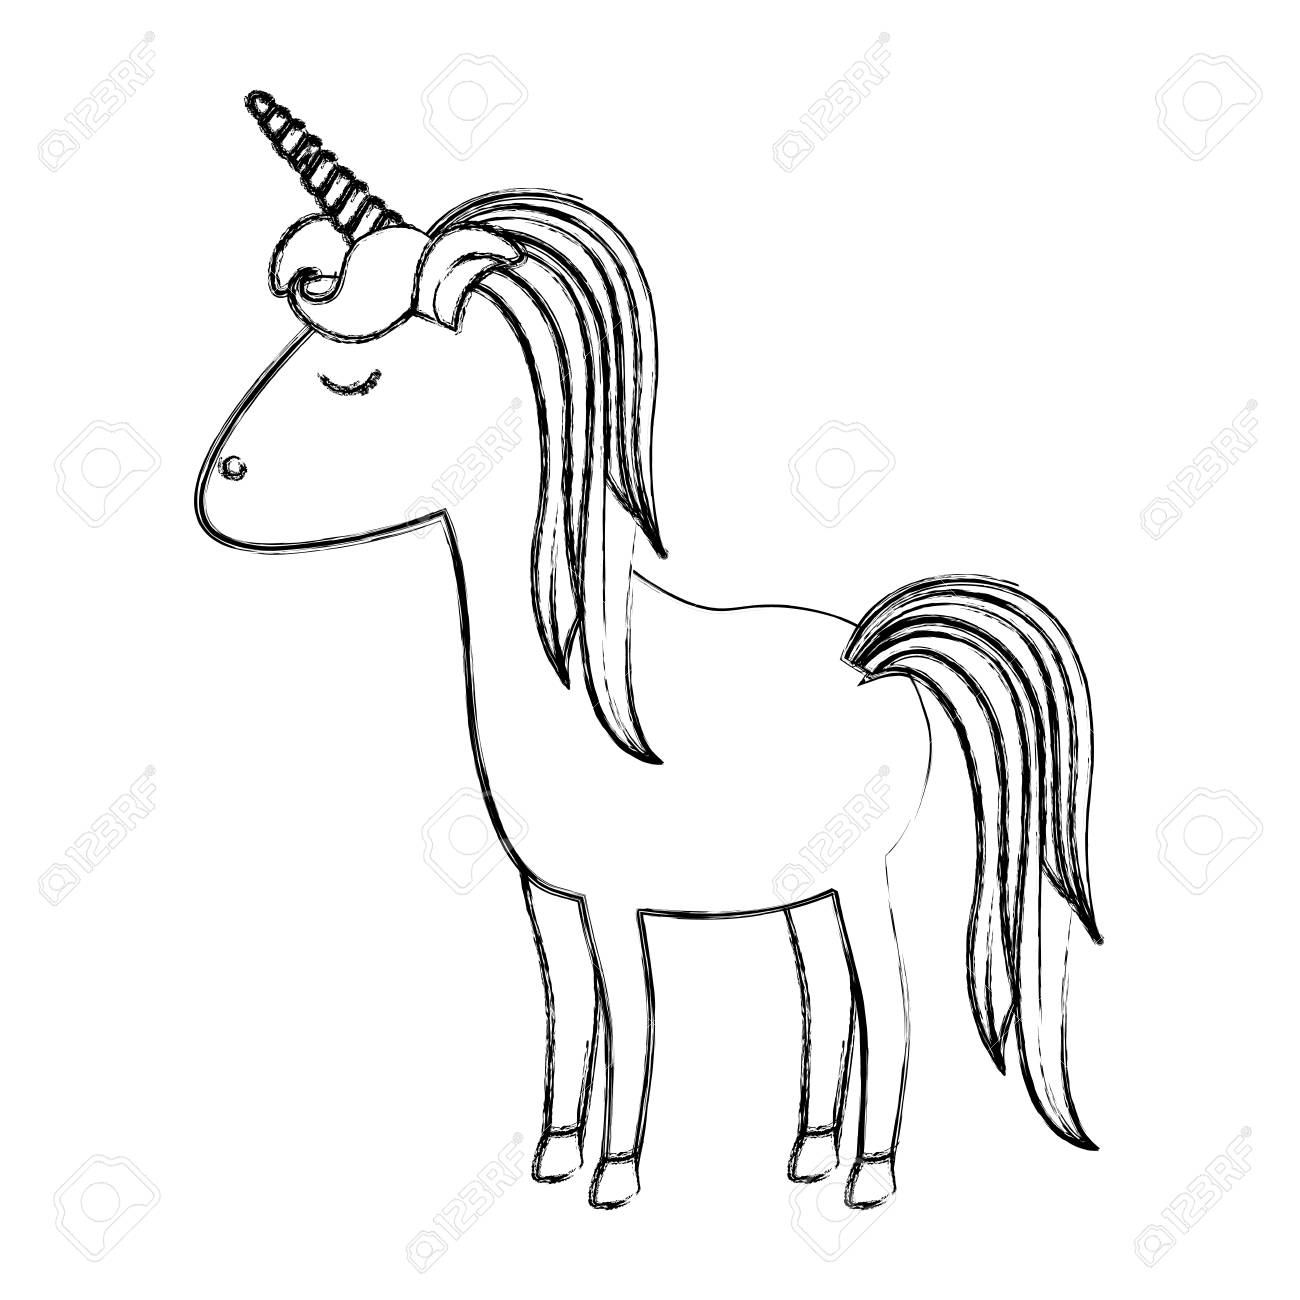 1300x1300 Monochrome Blurred Silhouette Of Cartoon Unicorn Standing